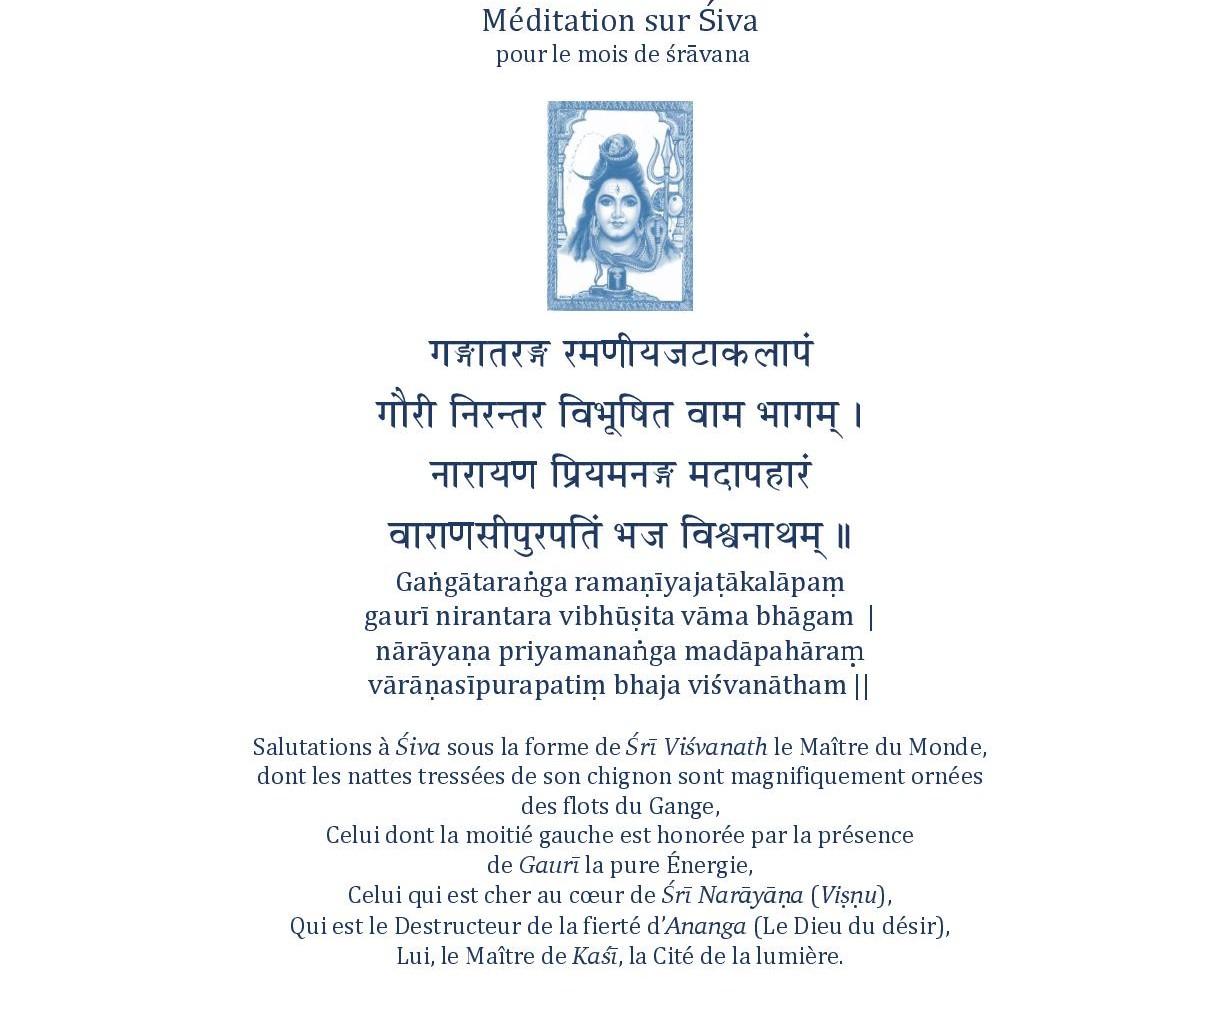 verset 3 méditation sur Shiva-page-001